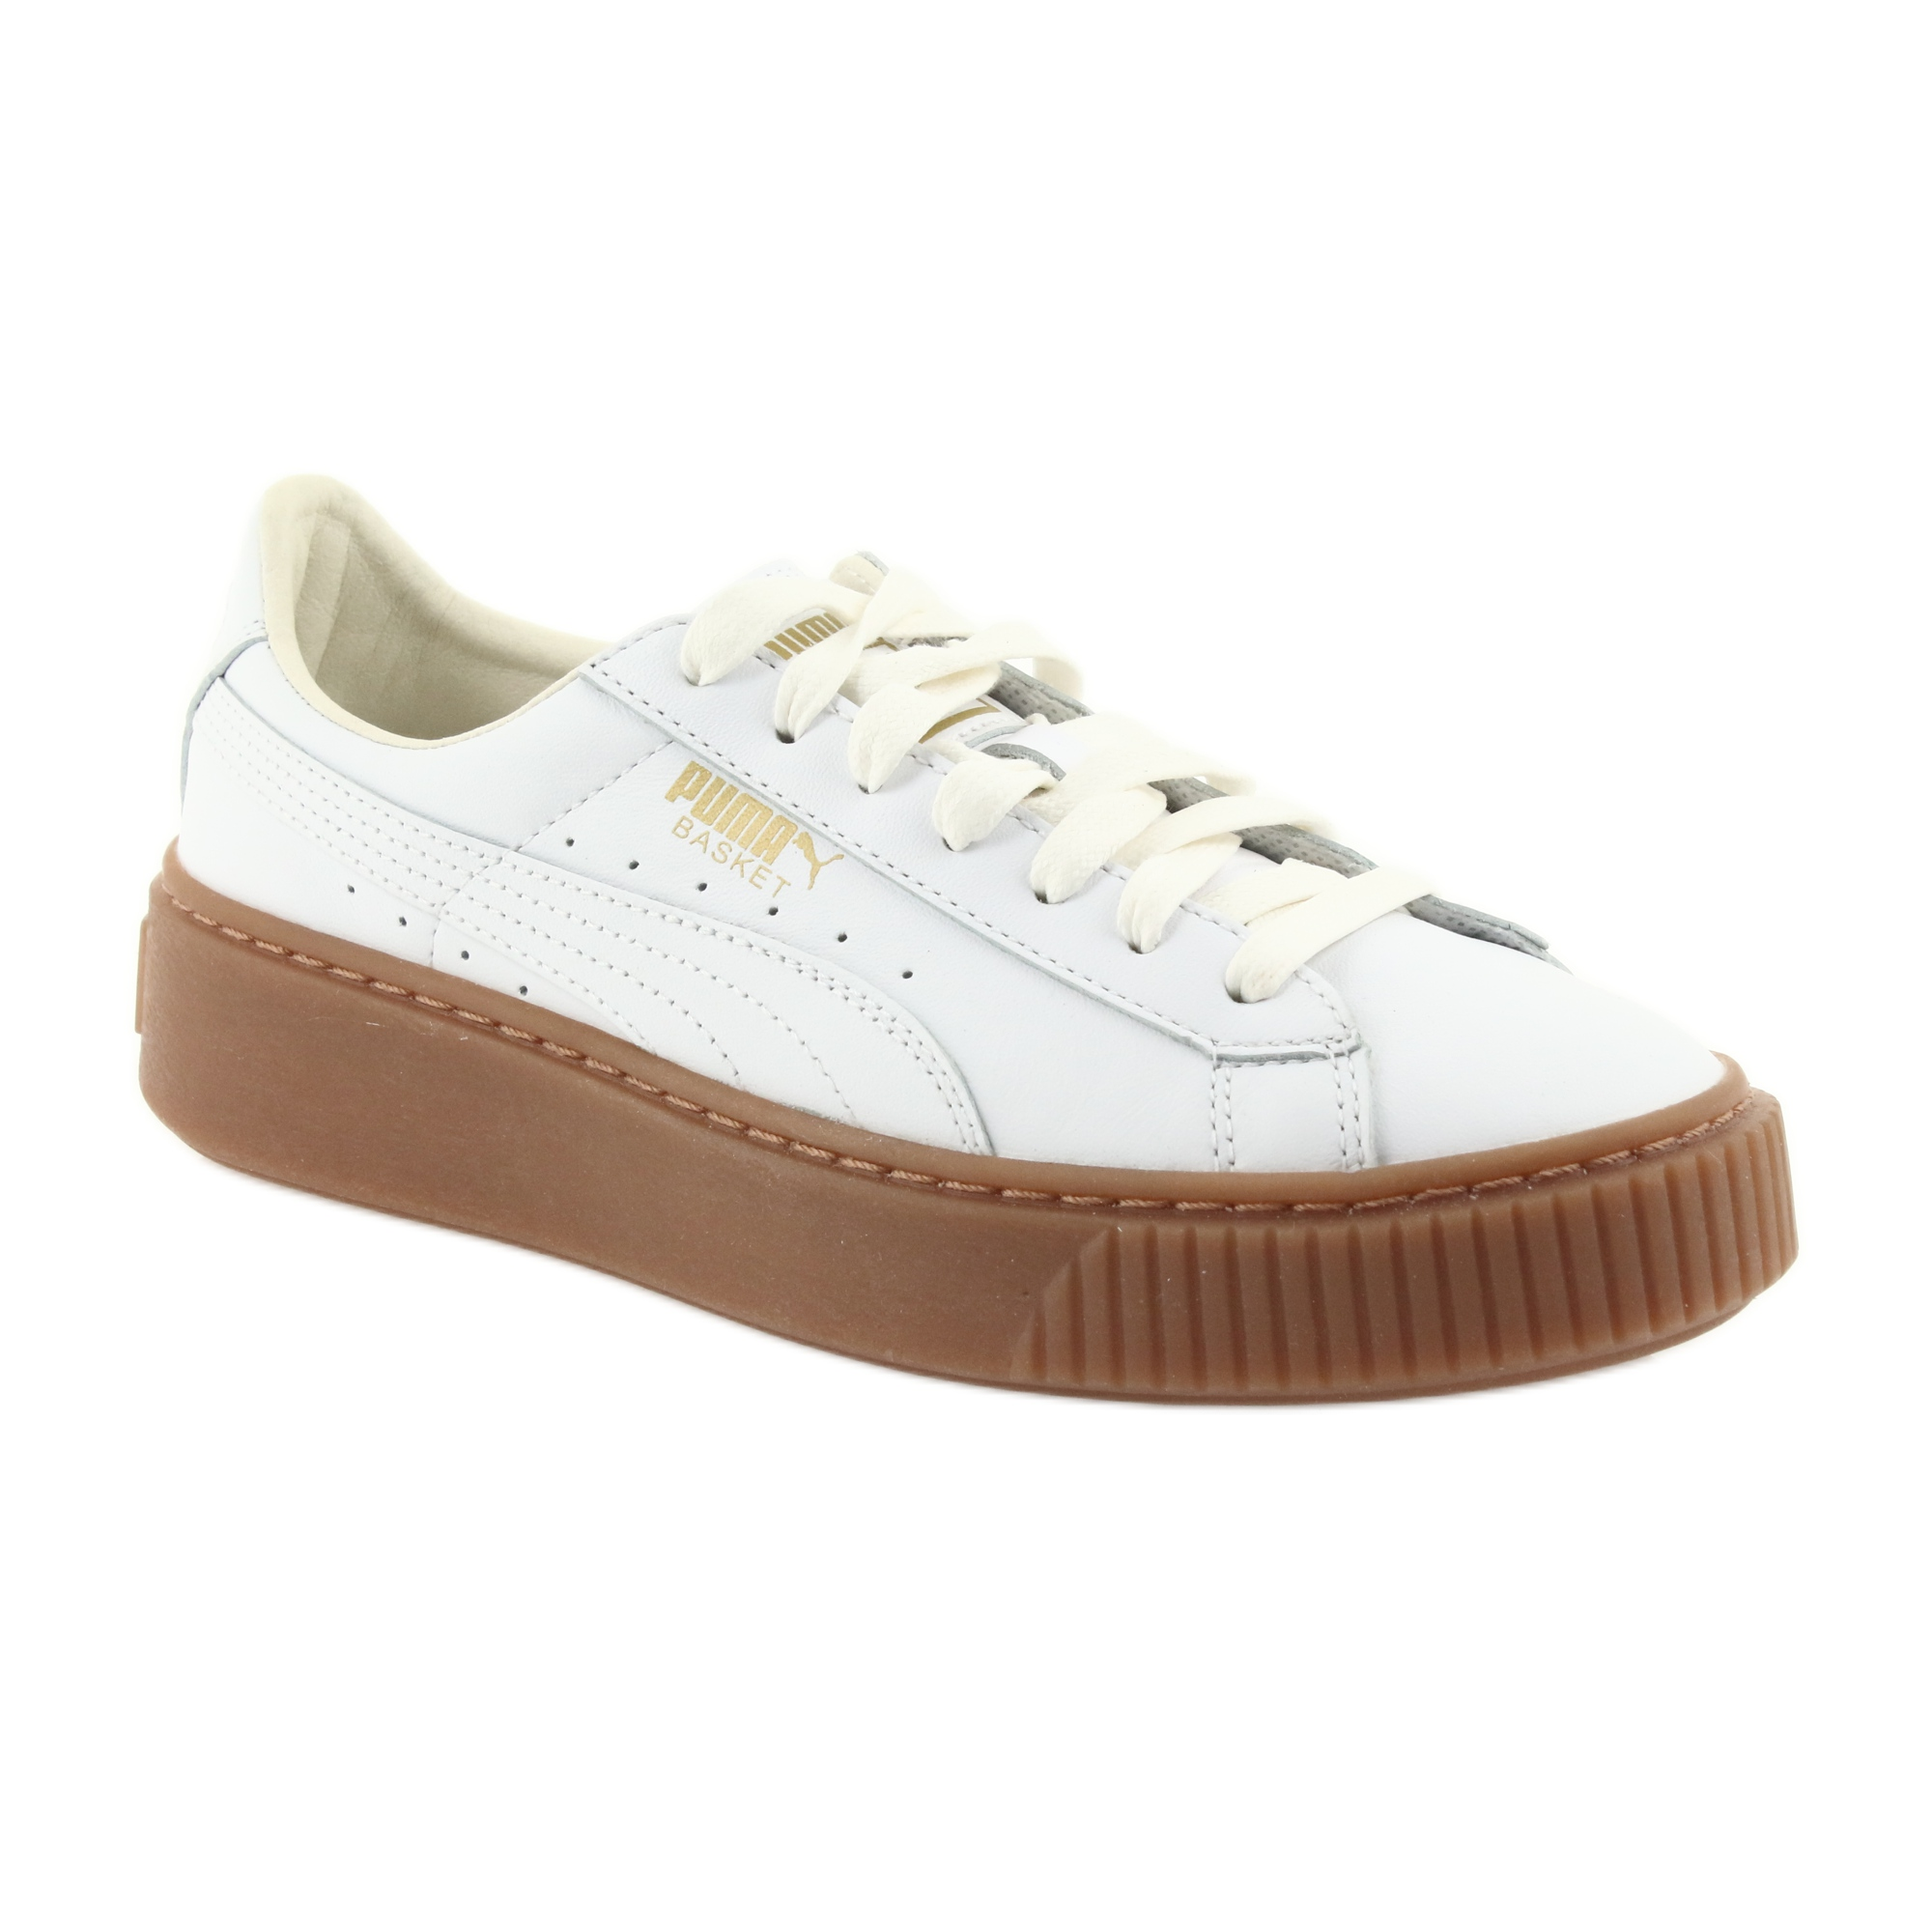 Puma blanc Chaussures femme Basket Platform Core W 001